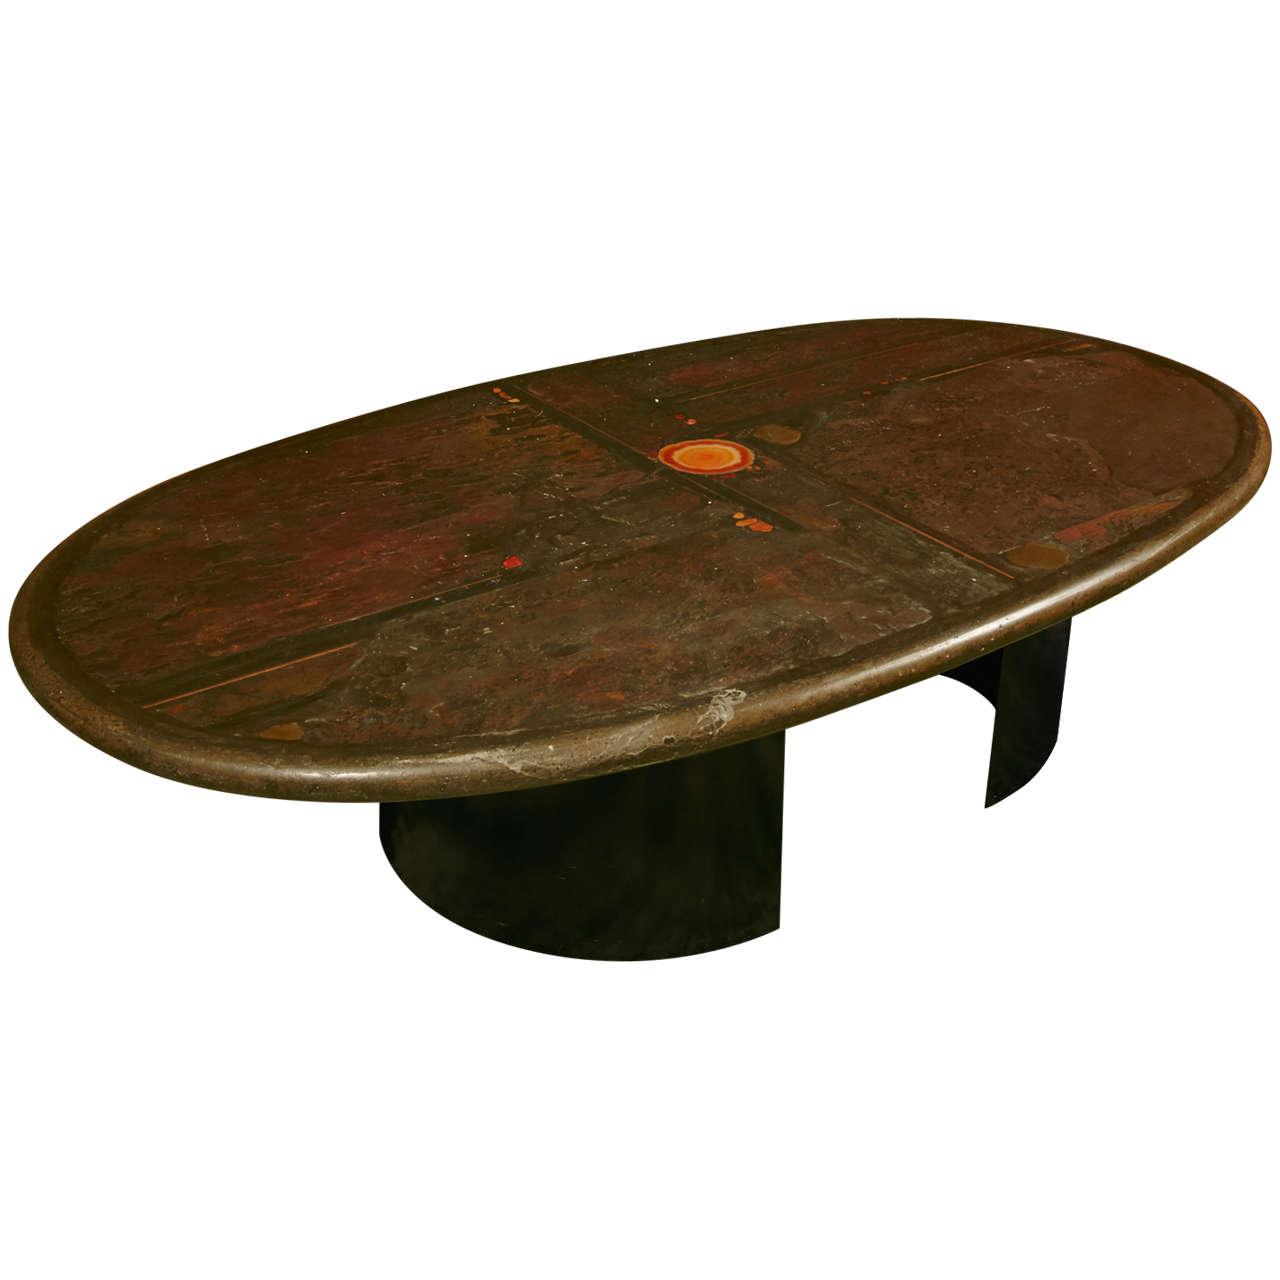 Very Rare Oval Large Coffee Table By Paul Kingma